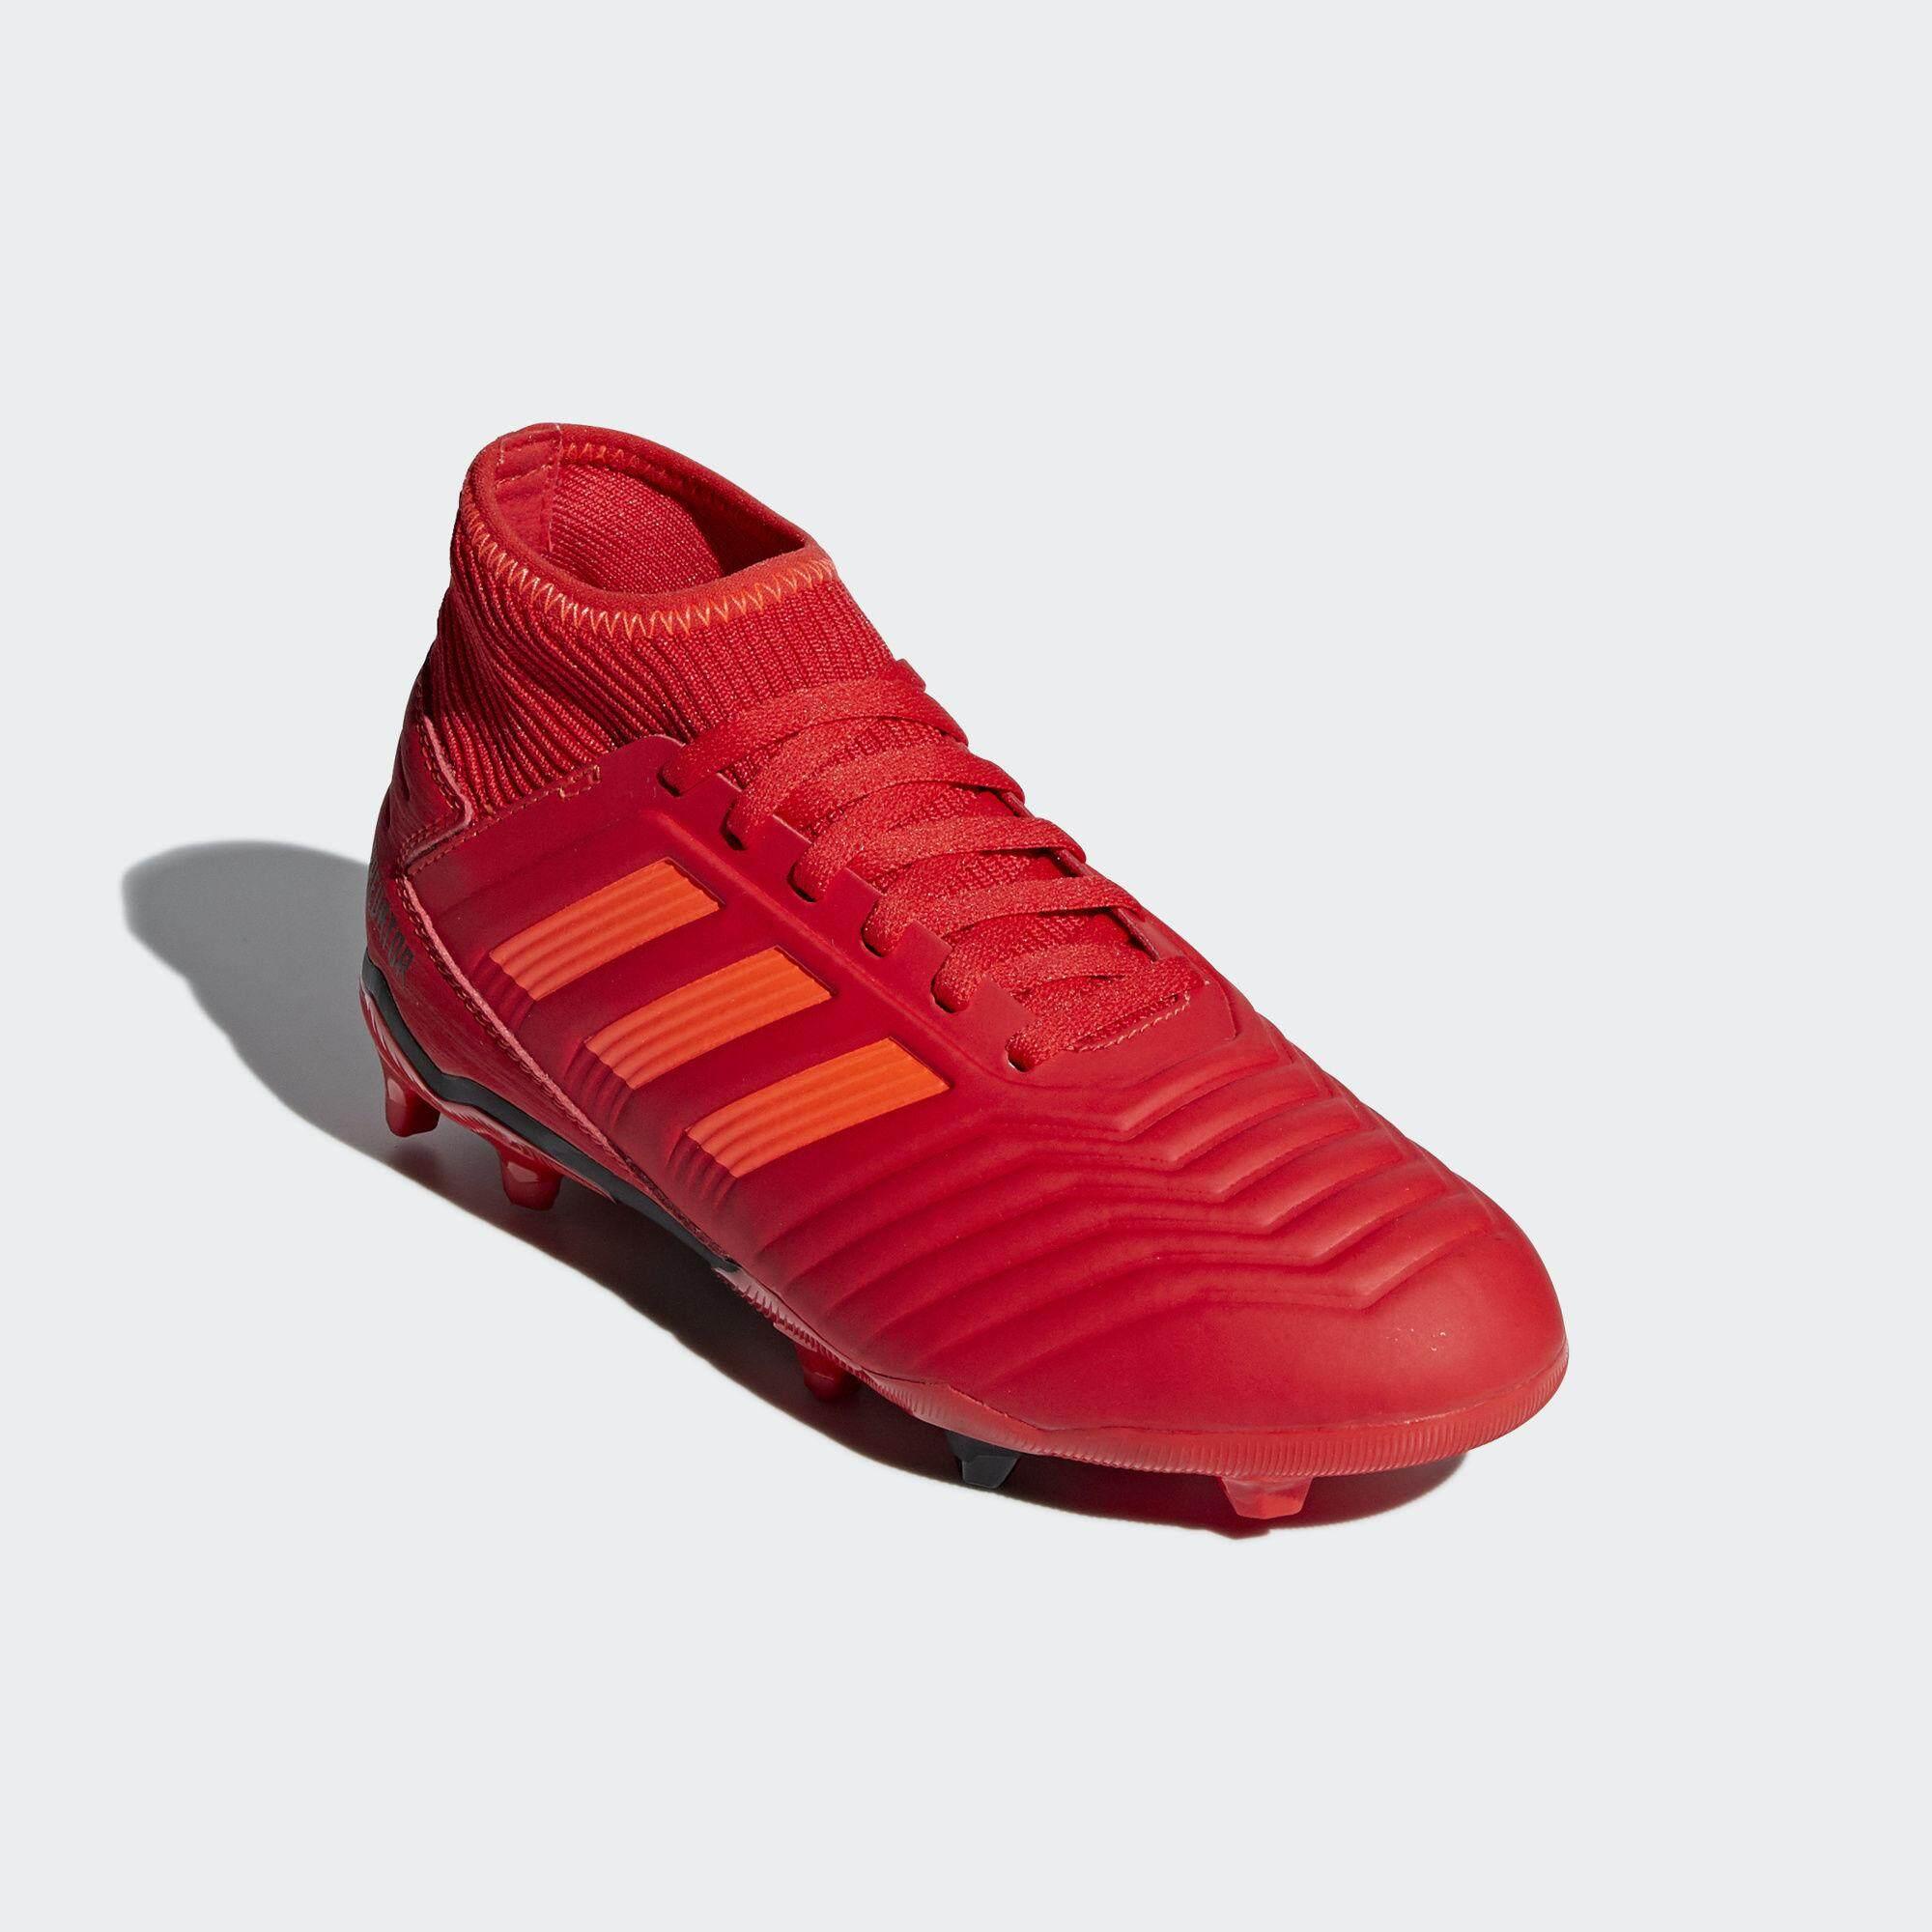 98ef2e14745b Adidas อาดิดาส รองเท้า ฟุตบอลเด็ก Football JUNIOR Shoe Predator 19.3 FG  CM8534 (